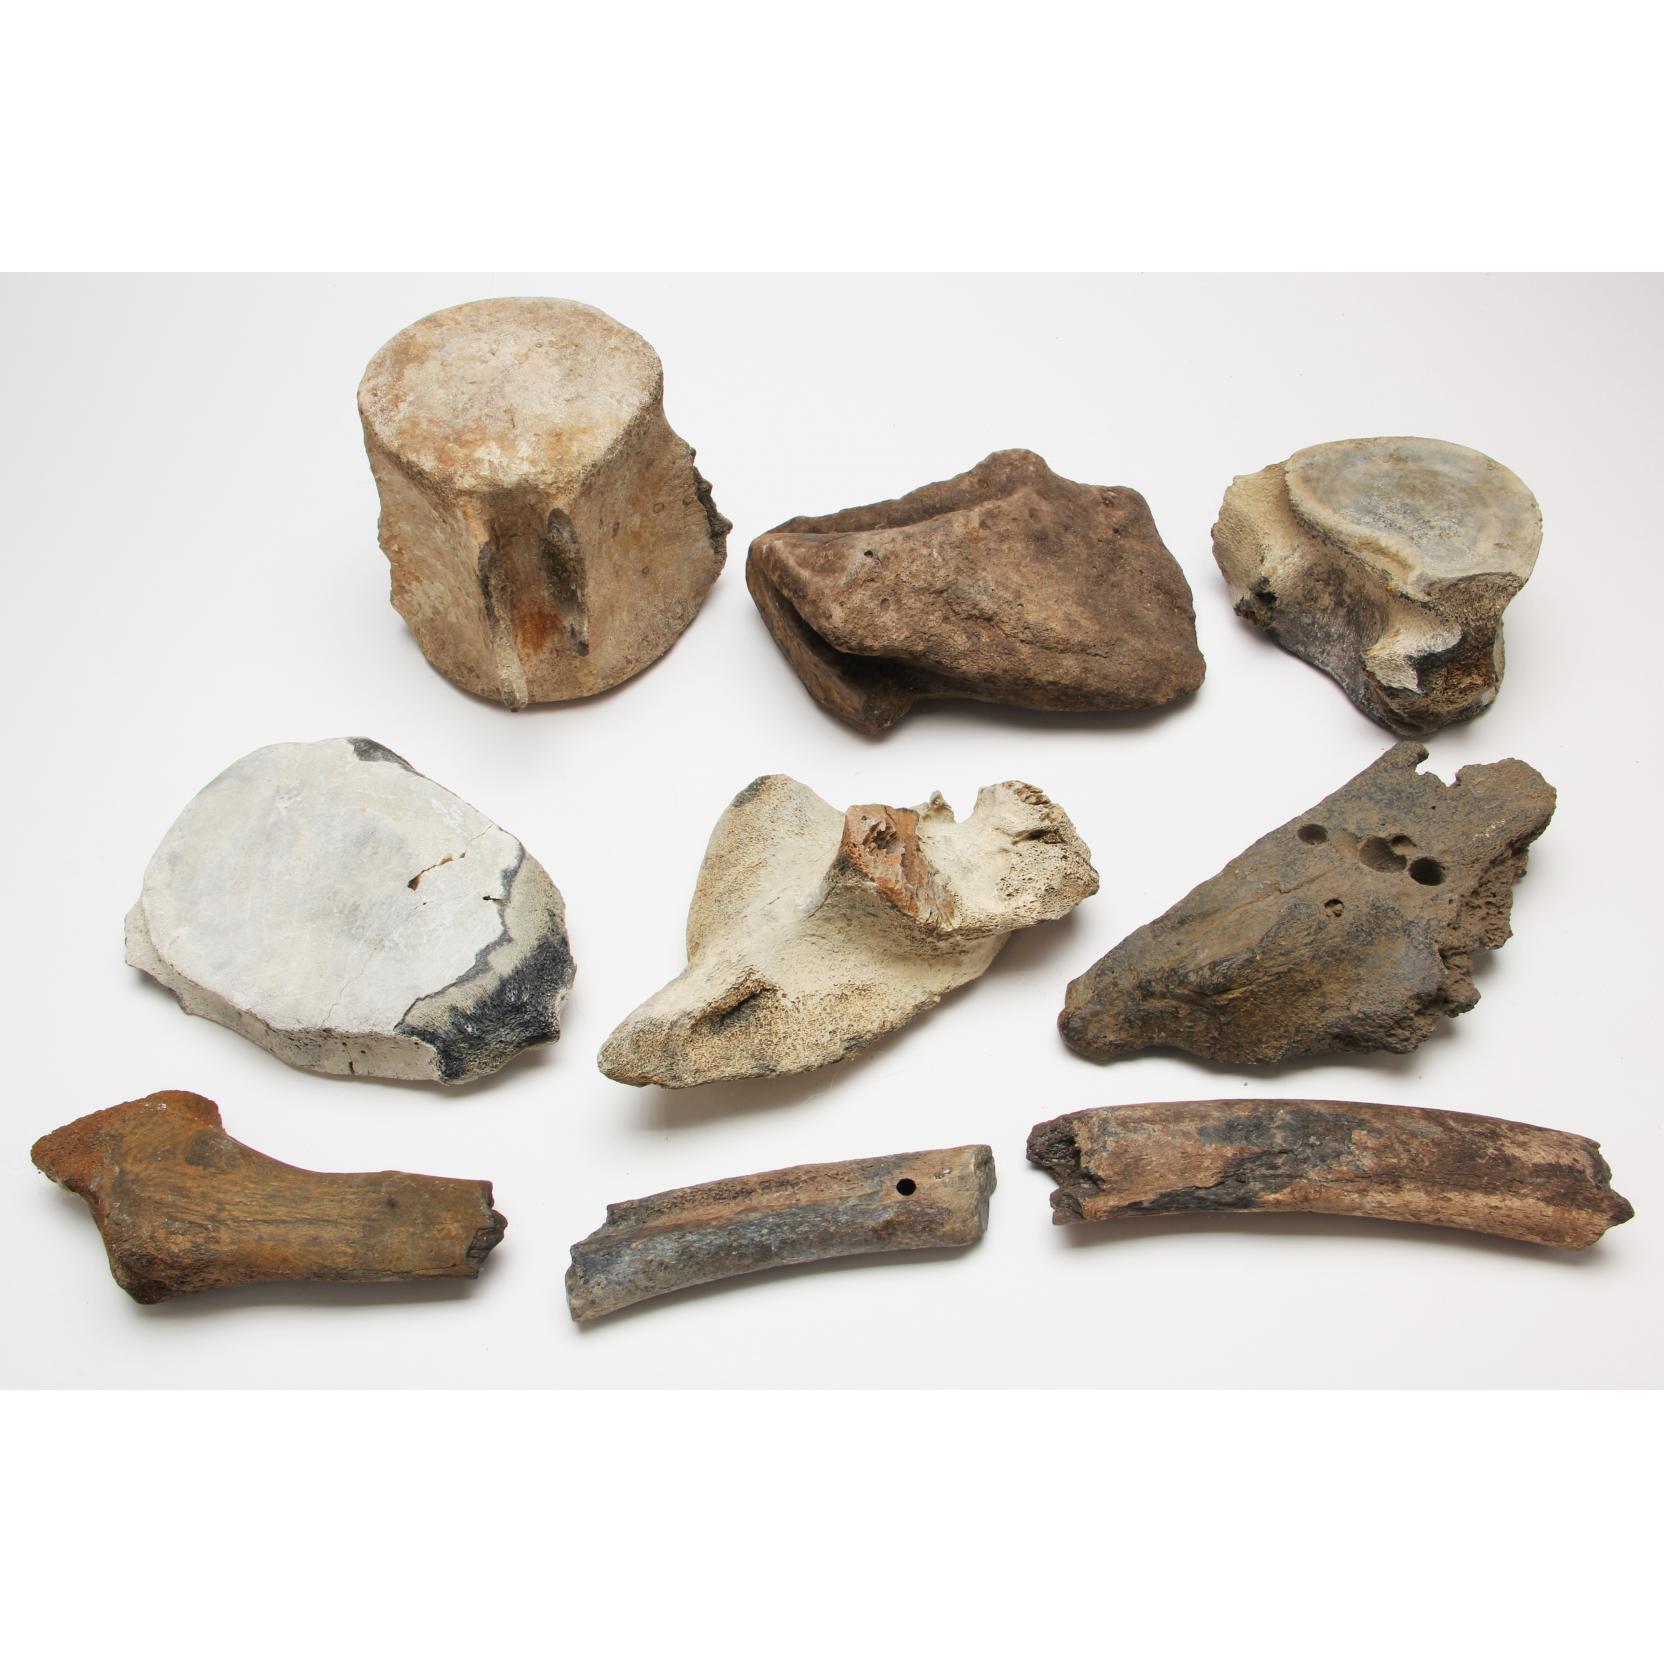 nine-fossilized-whale-bones-and-bone-fragments